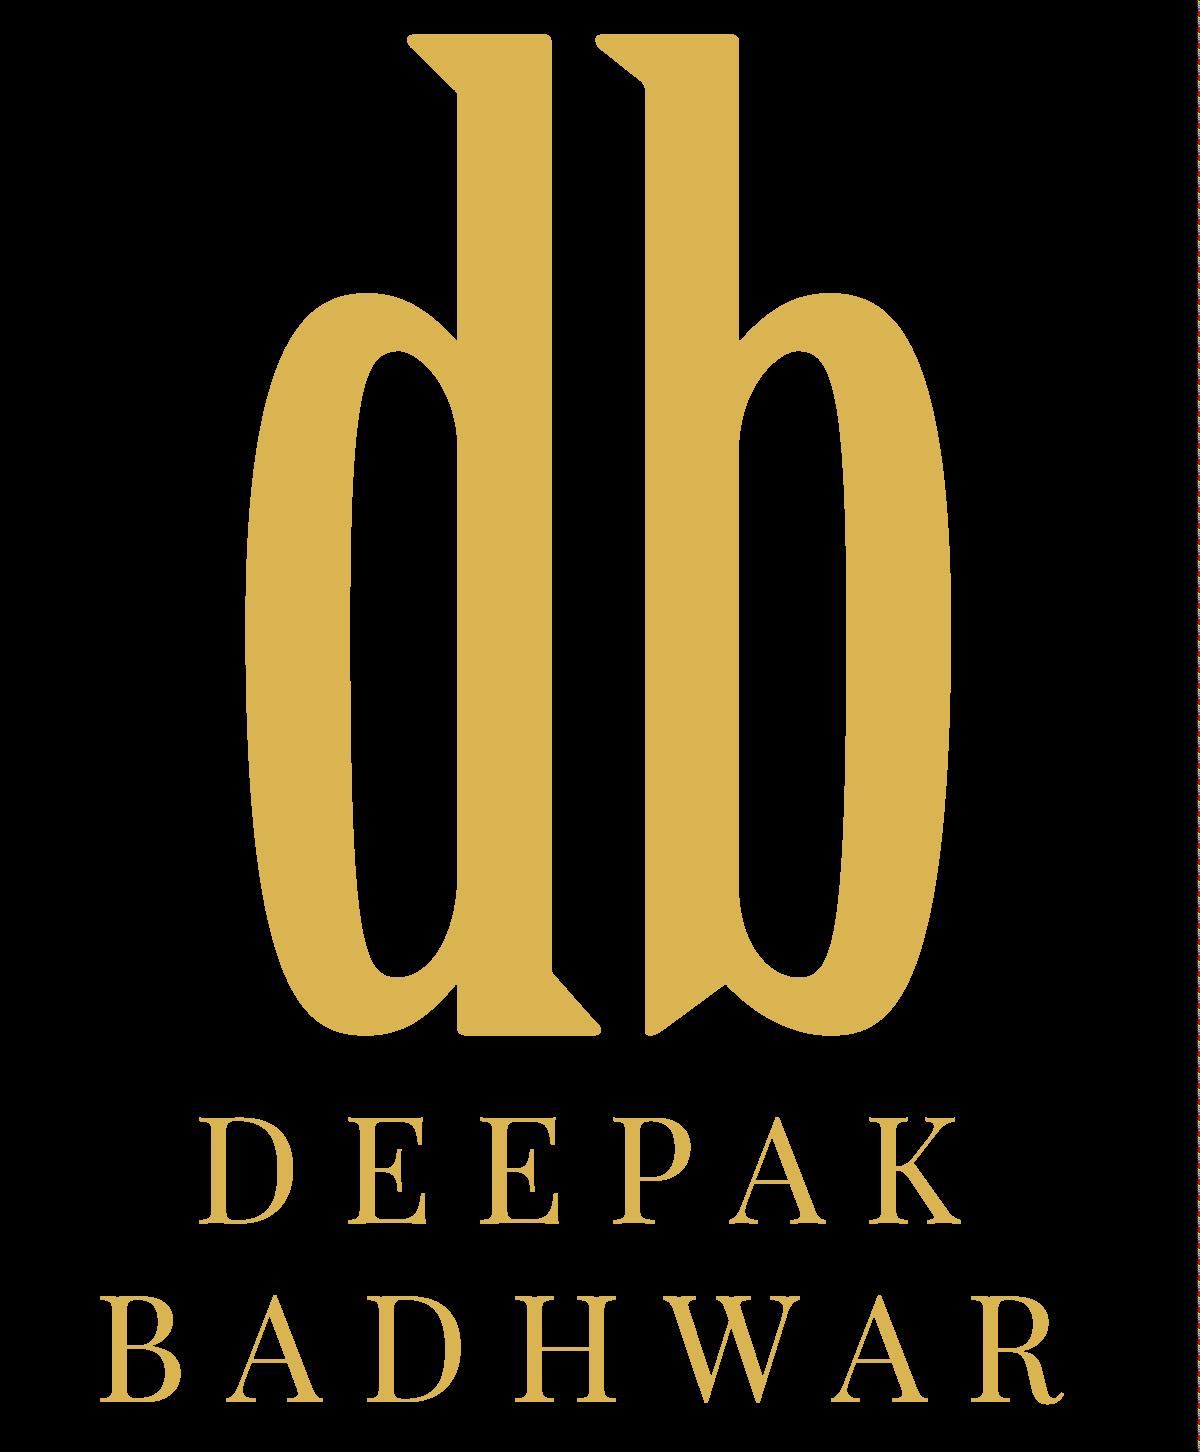 DeepakBadhwar-1.png